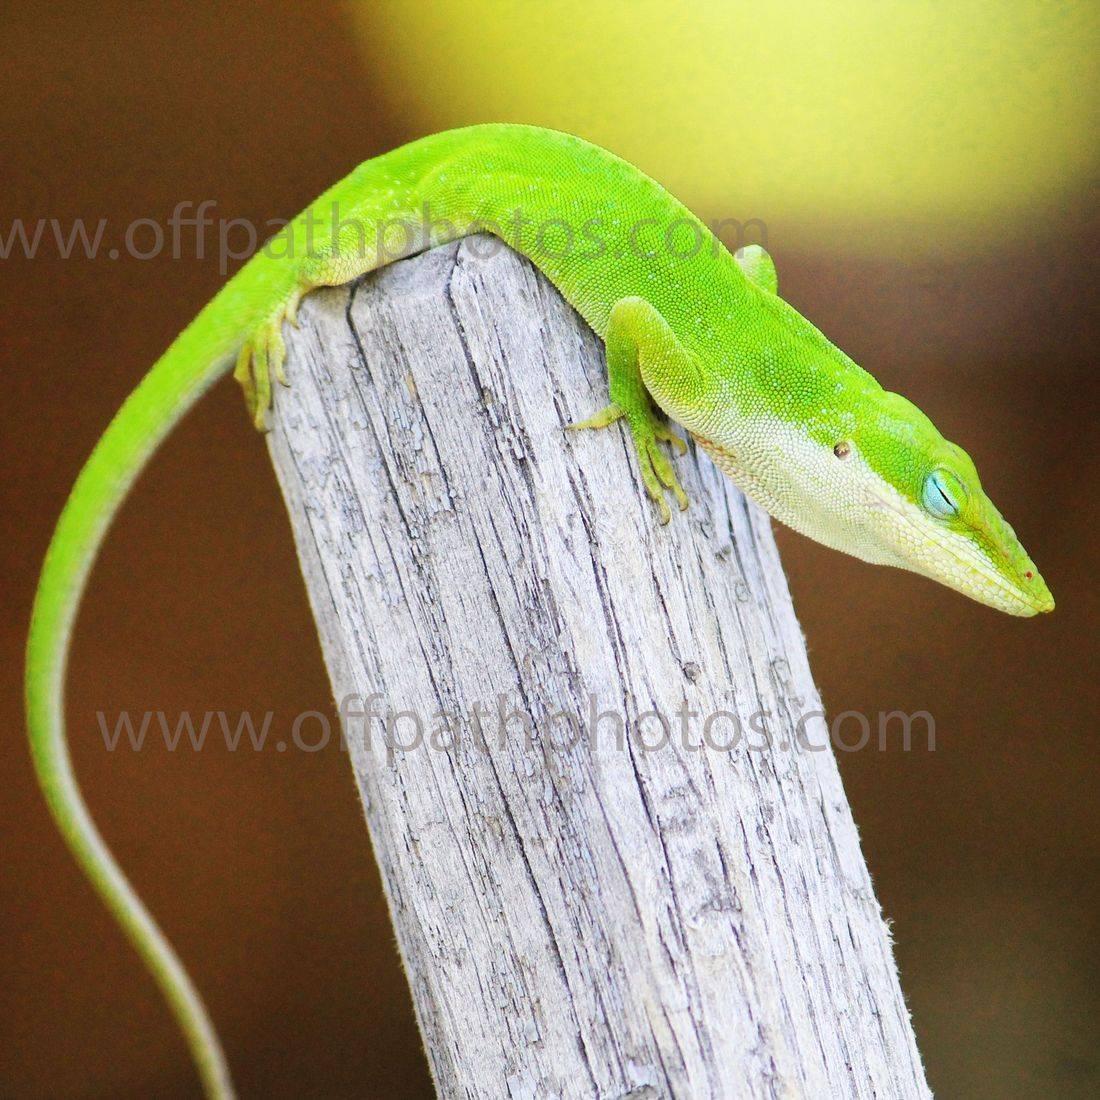 photography, nature, animals, reptiles, green anole lizards, sleeping, gardens